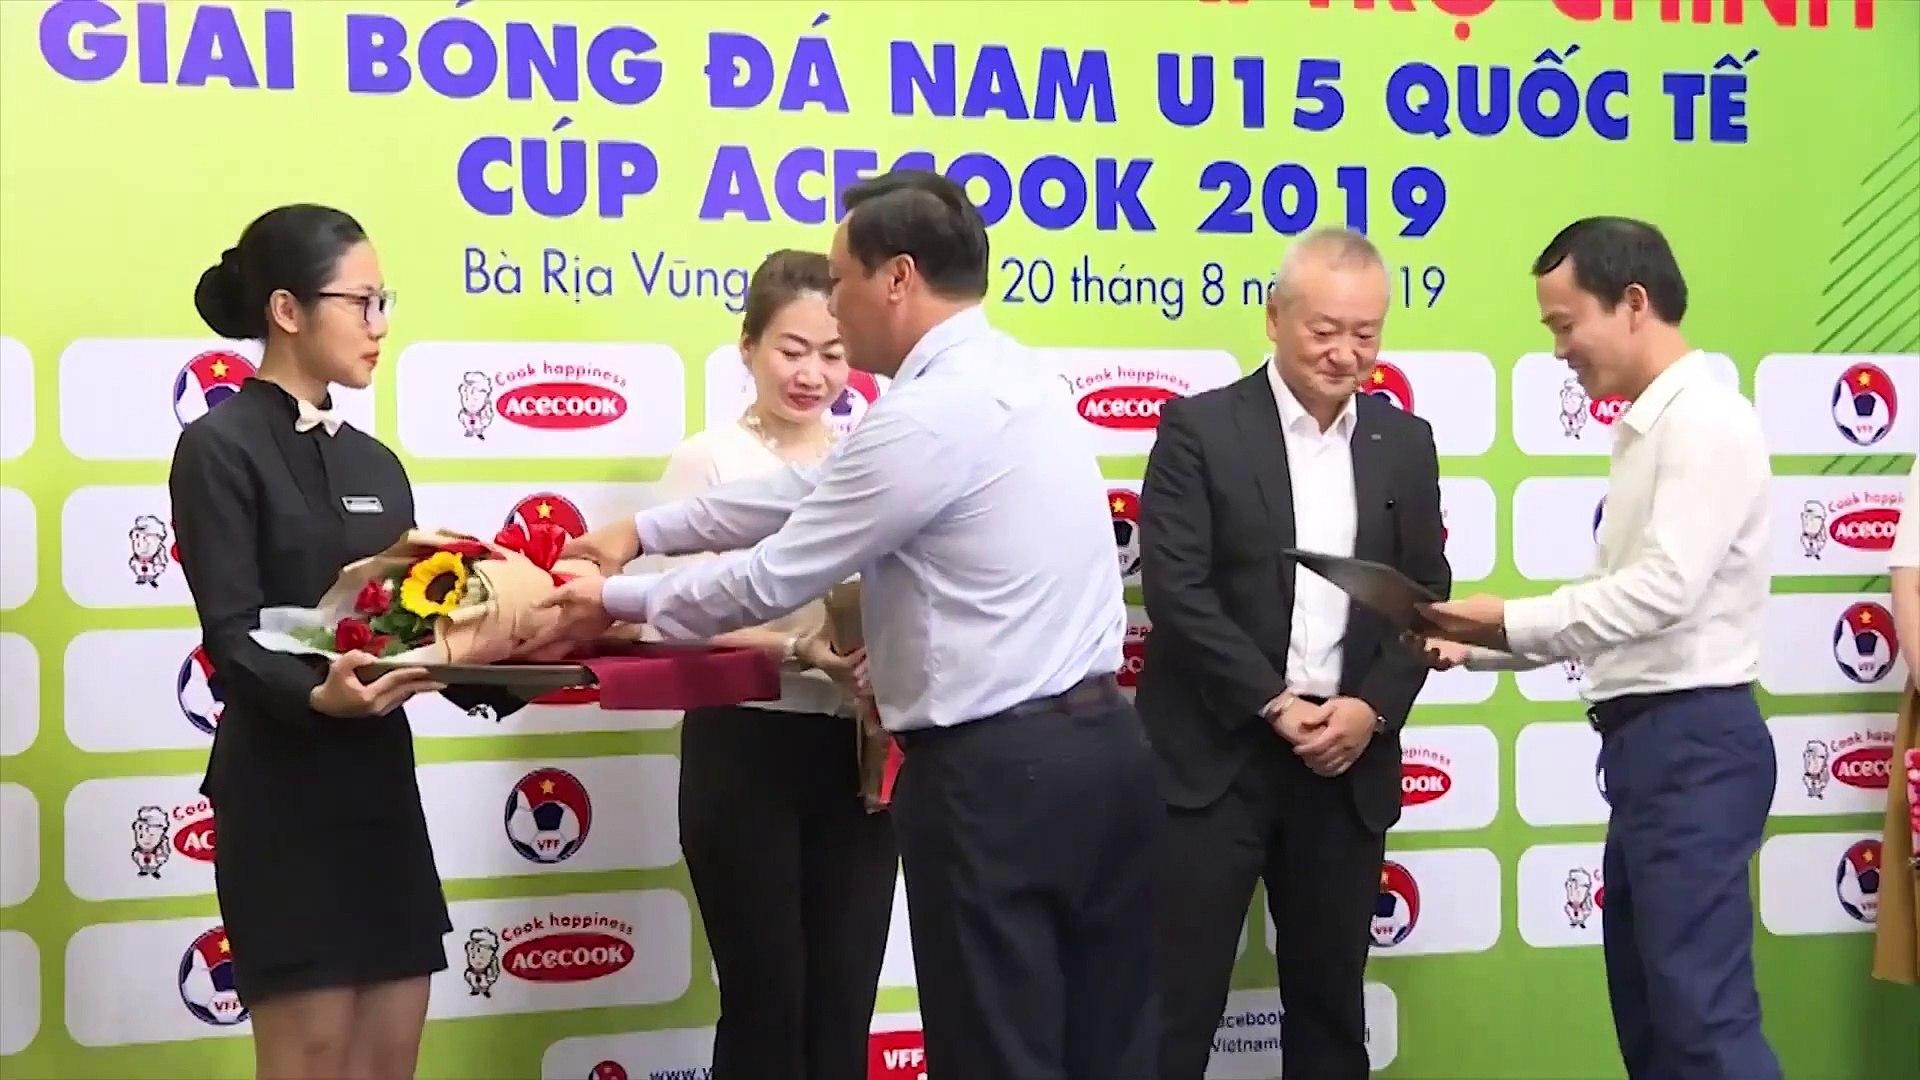 TRỰC TIẾP   U15 Việt Nam - U15 Myanmar   U15 Quốc tế - Cúp Acecook 2019   VFF Channel